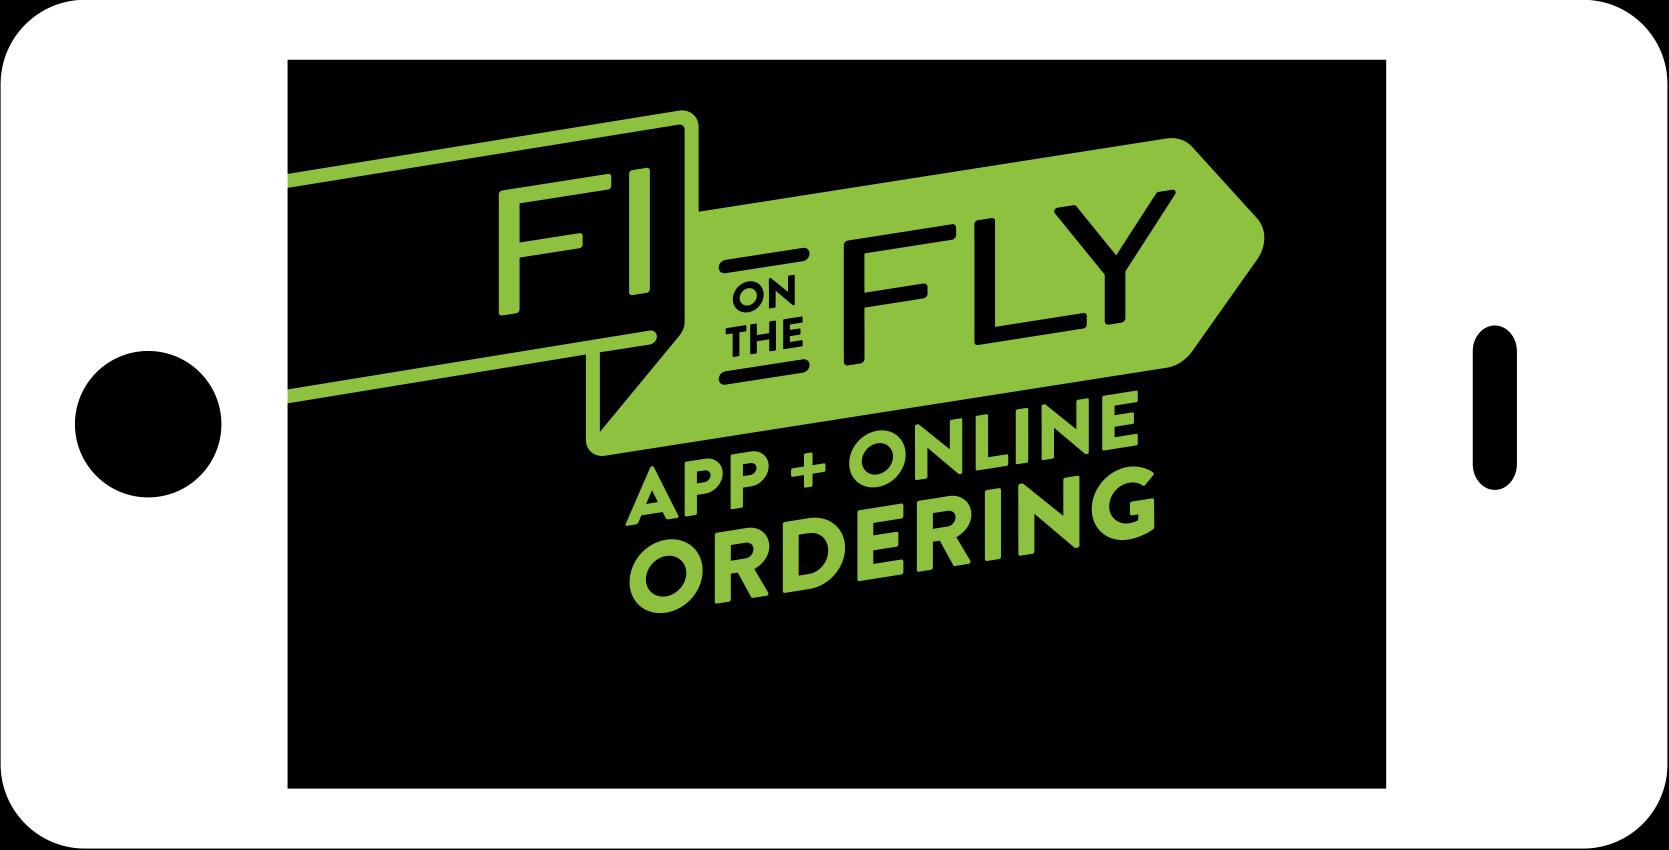 App + Online Ordering